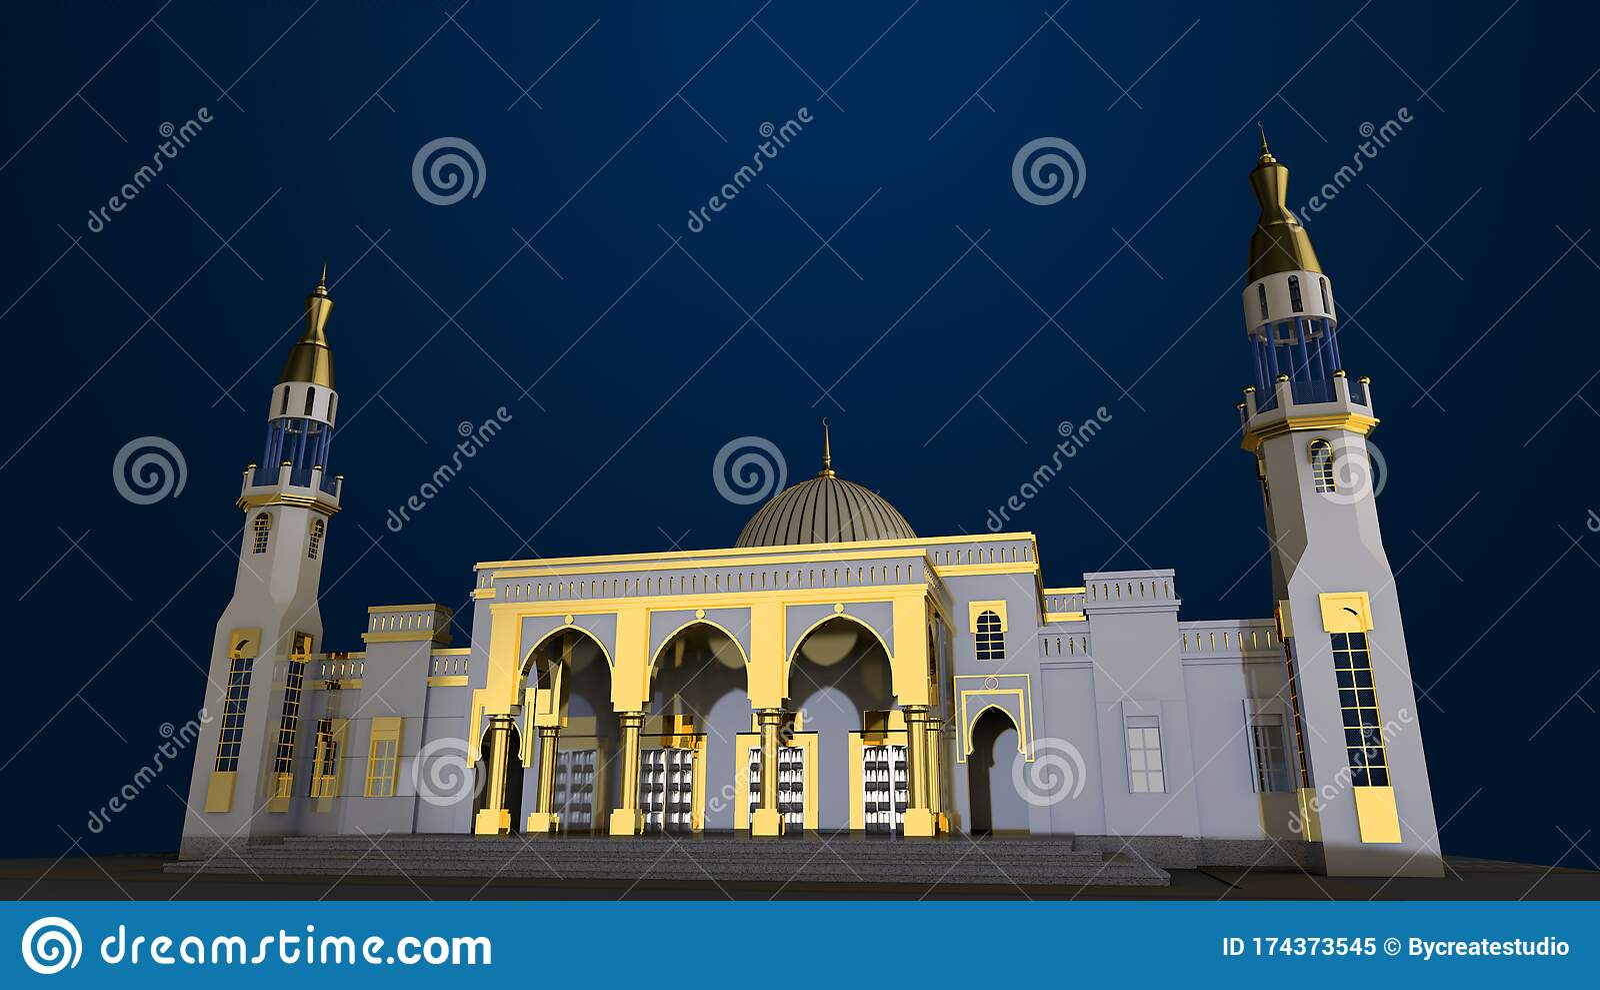 mosque wallpaper d rendering front view islamic backround gold blue materials dark 174373545